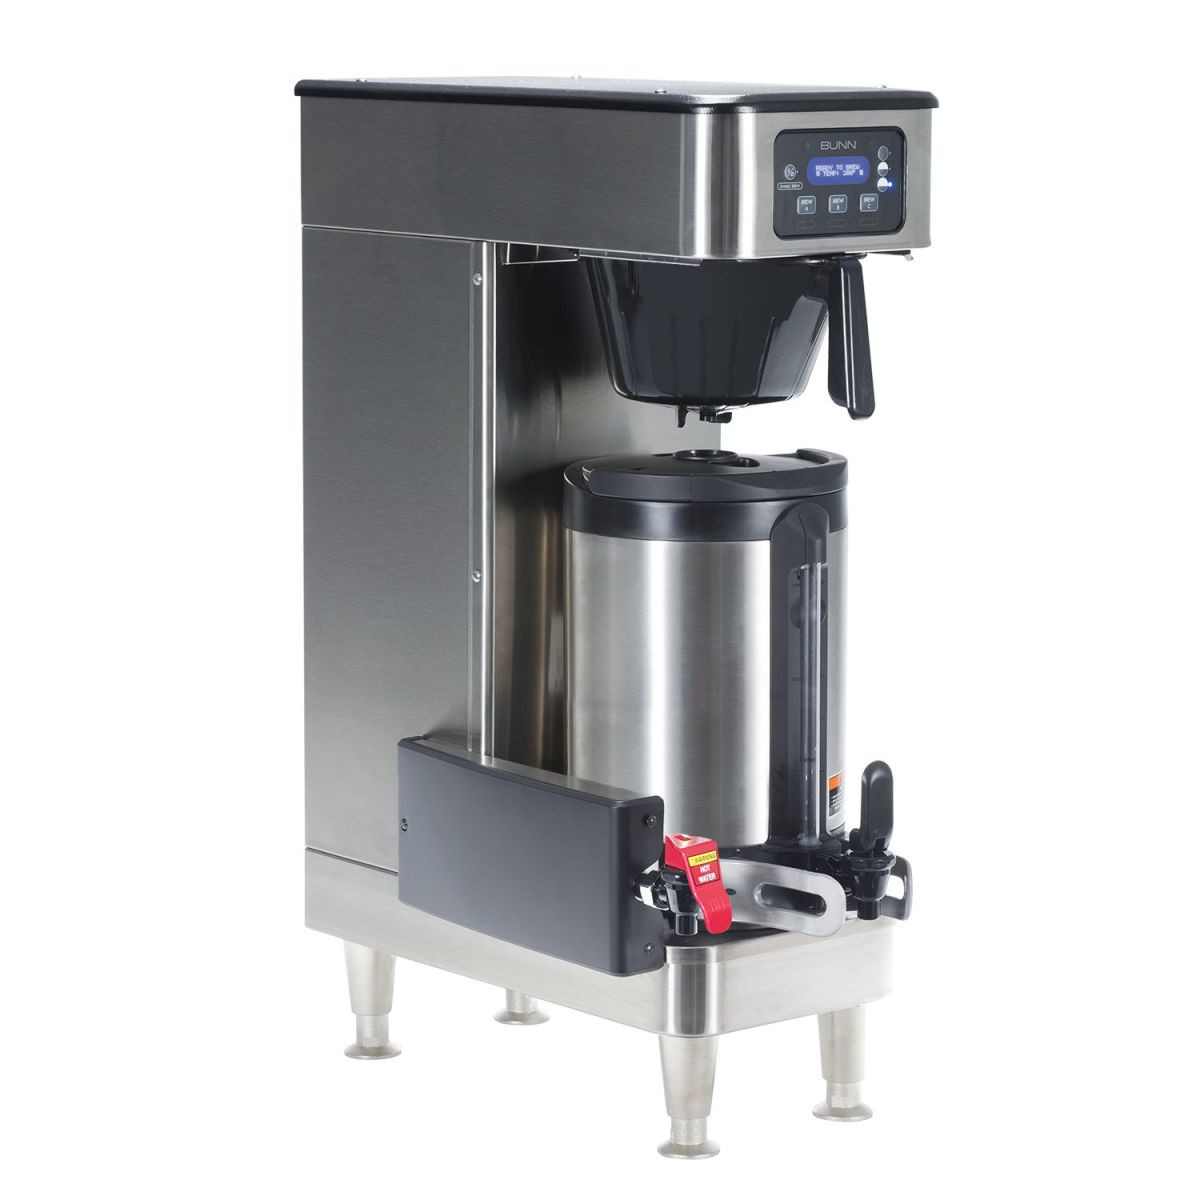 ICB SH Soft Heat®, 120/208V Stainless